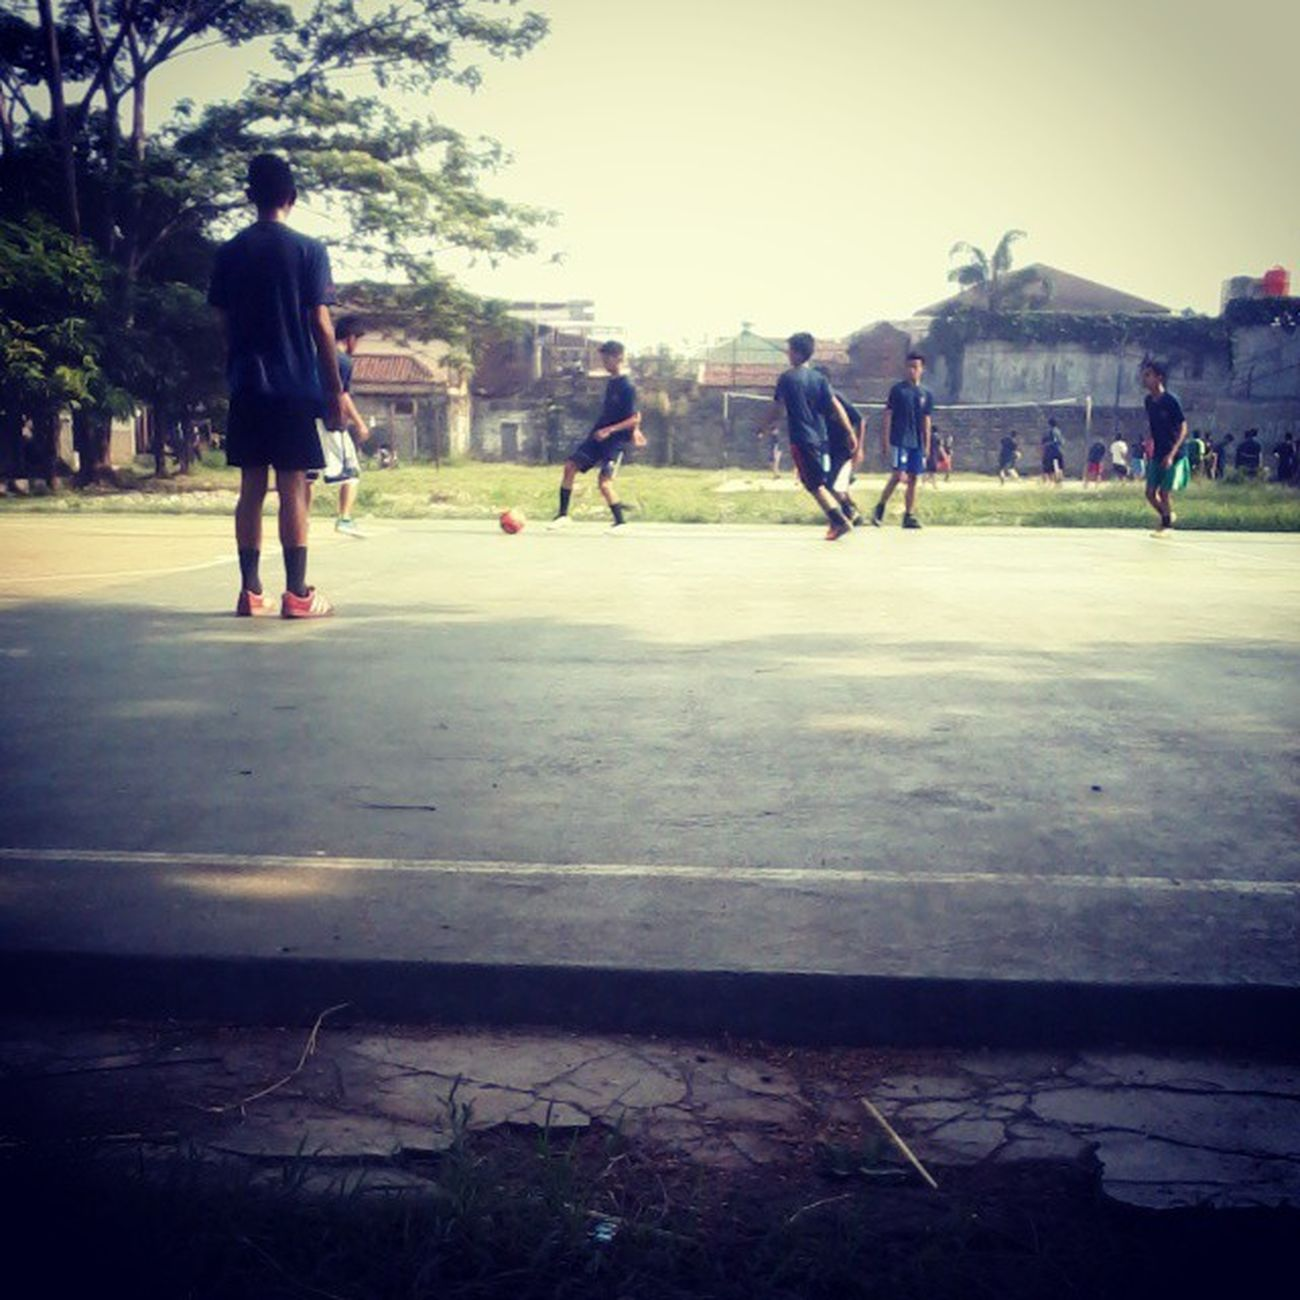 Tadi olahraga Lapangan Smk Pi 52 indonesia school